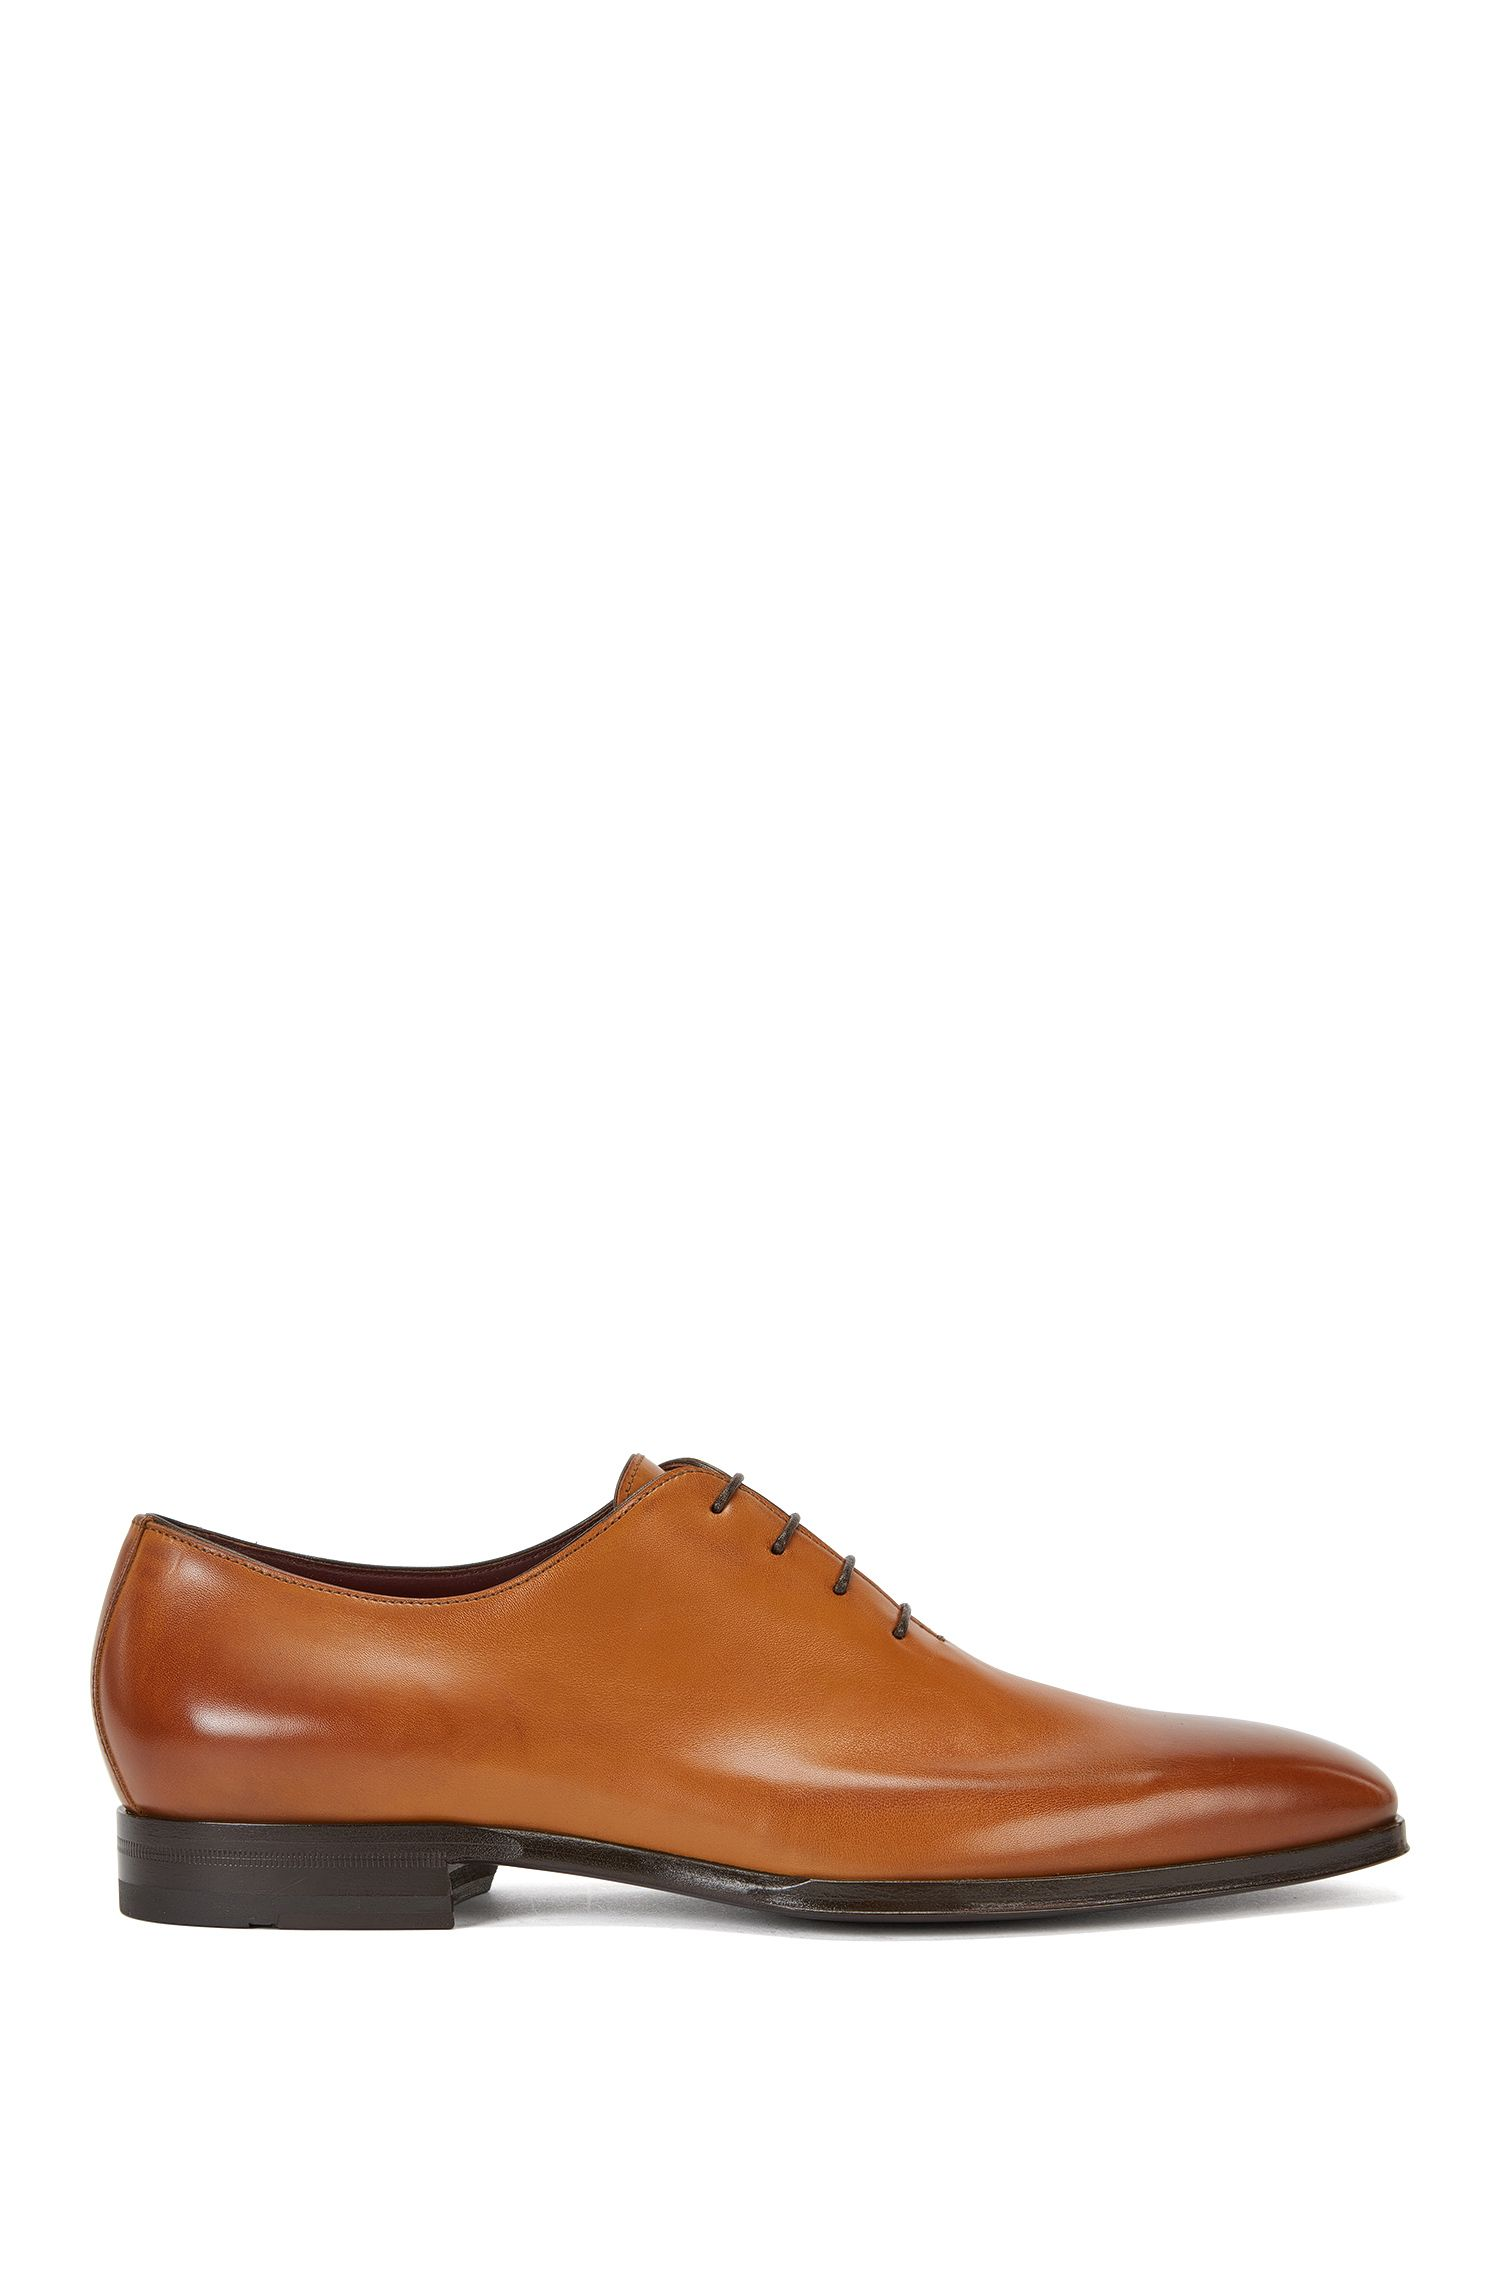 Italian Calfskin Oxford Dress Shoe | T-Club Oxfr ltpt